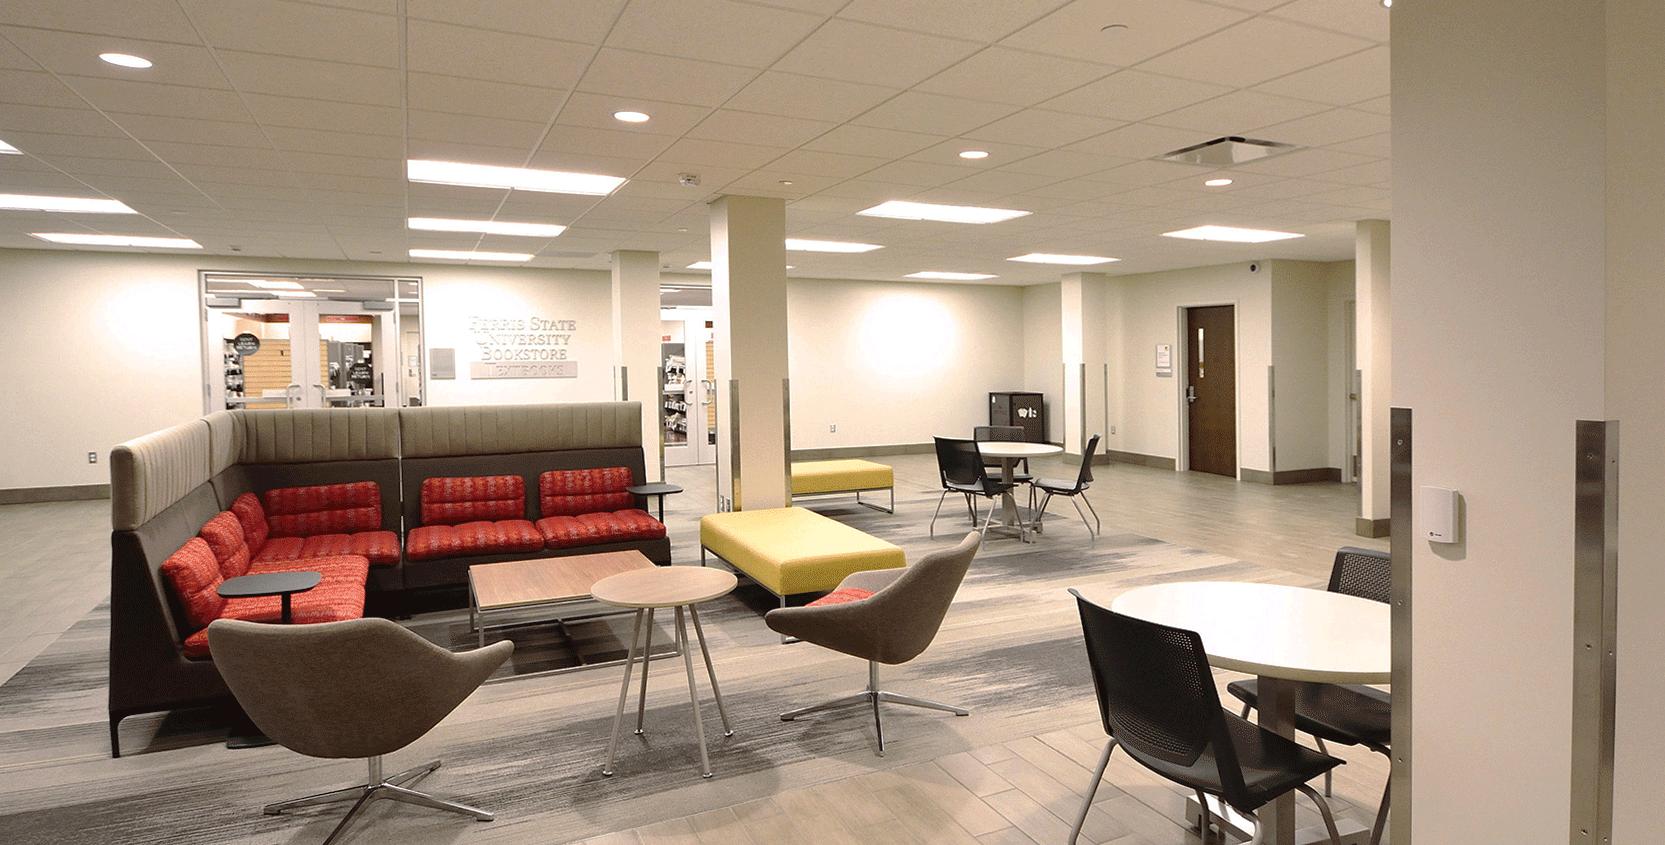 Ferris-State-University-University-Center-Lower-Lobby-2-1665x845